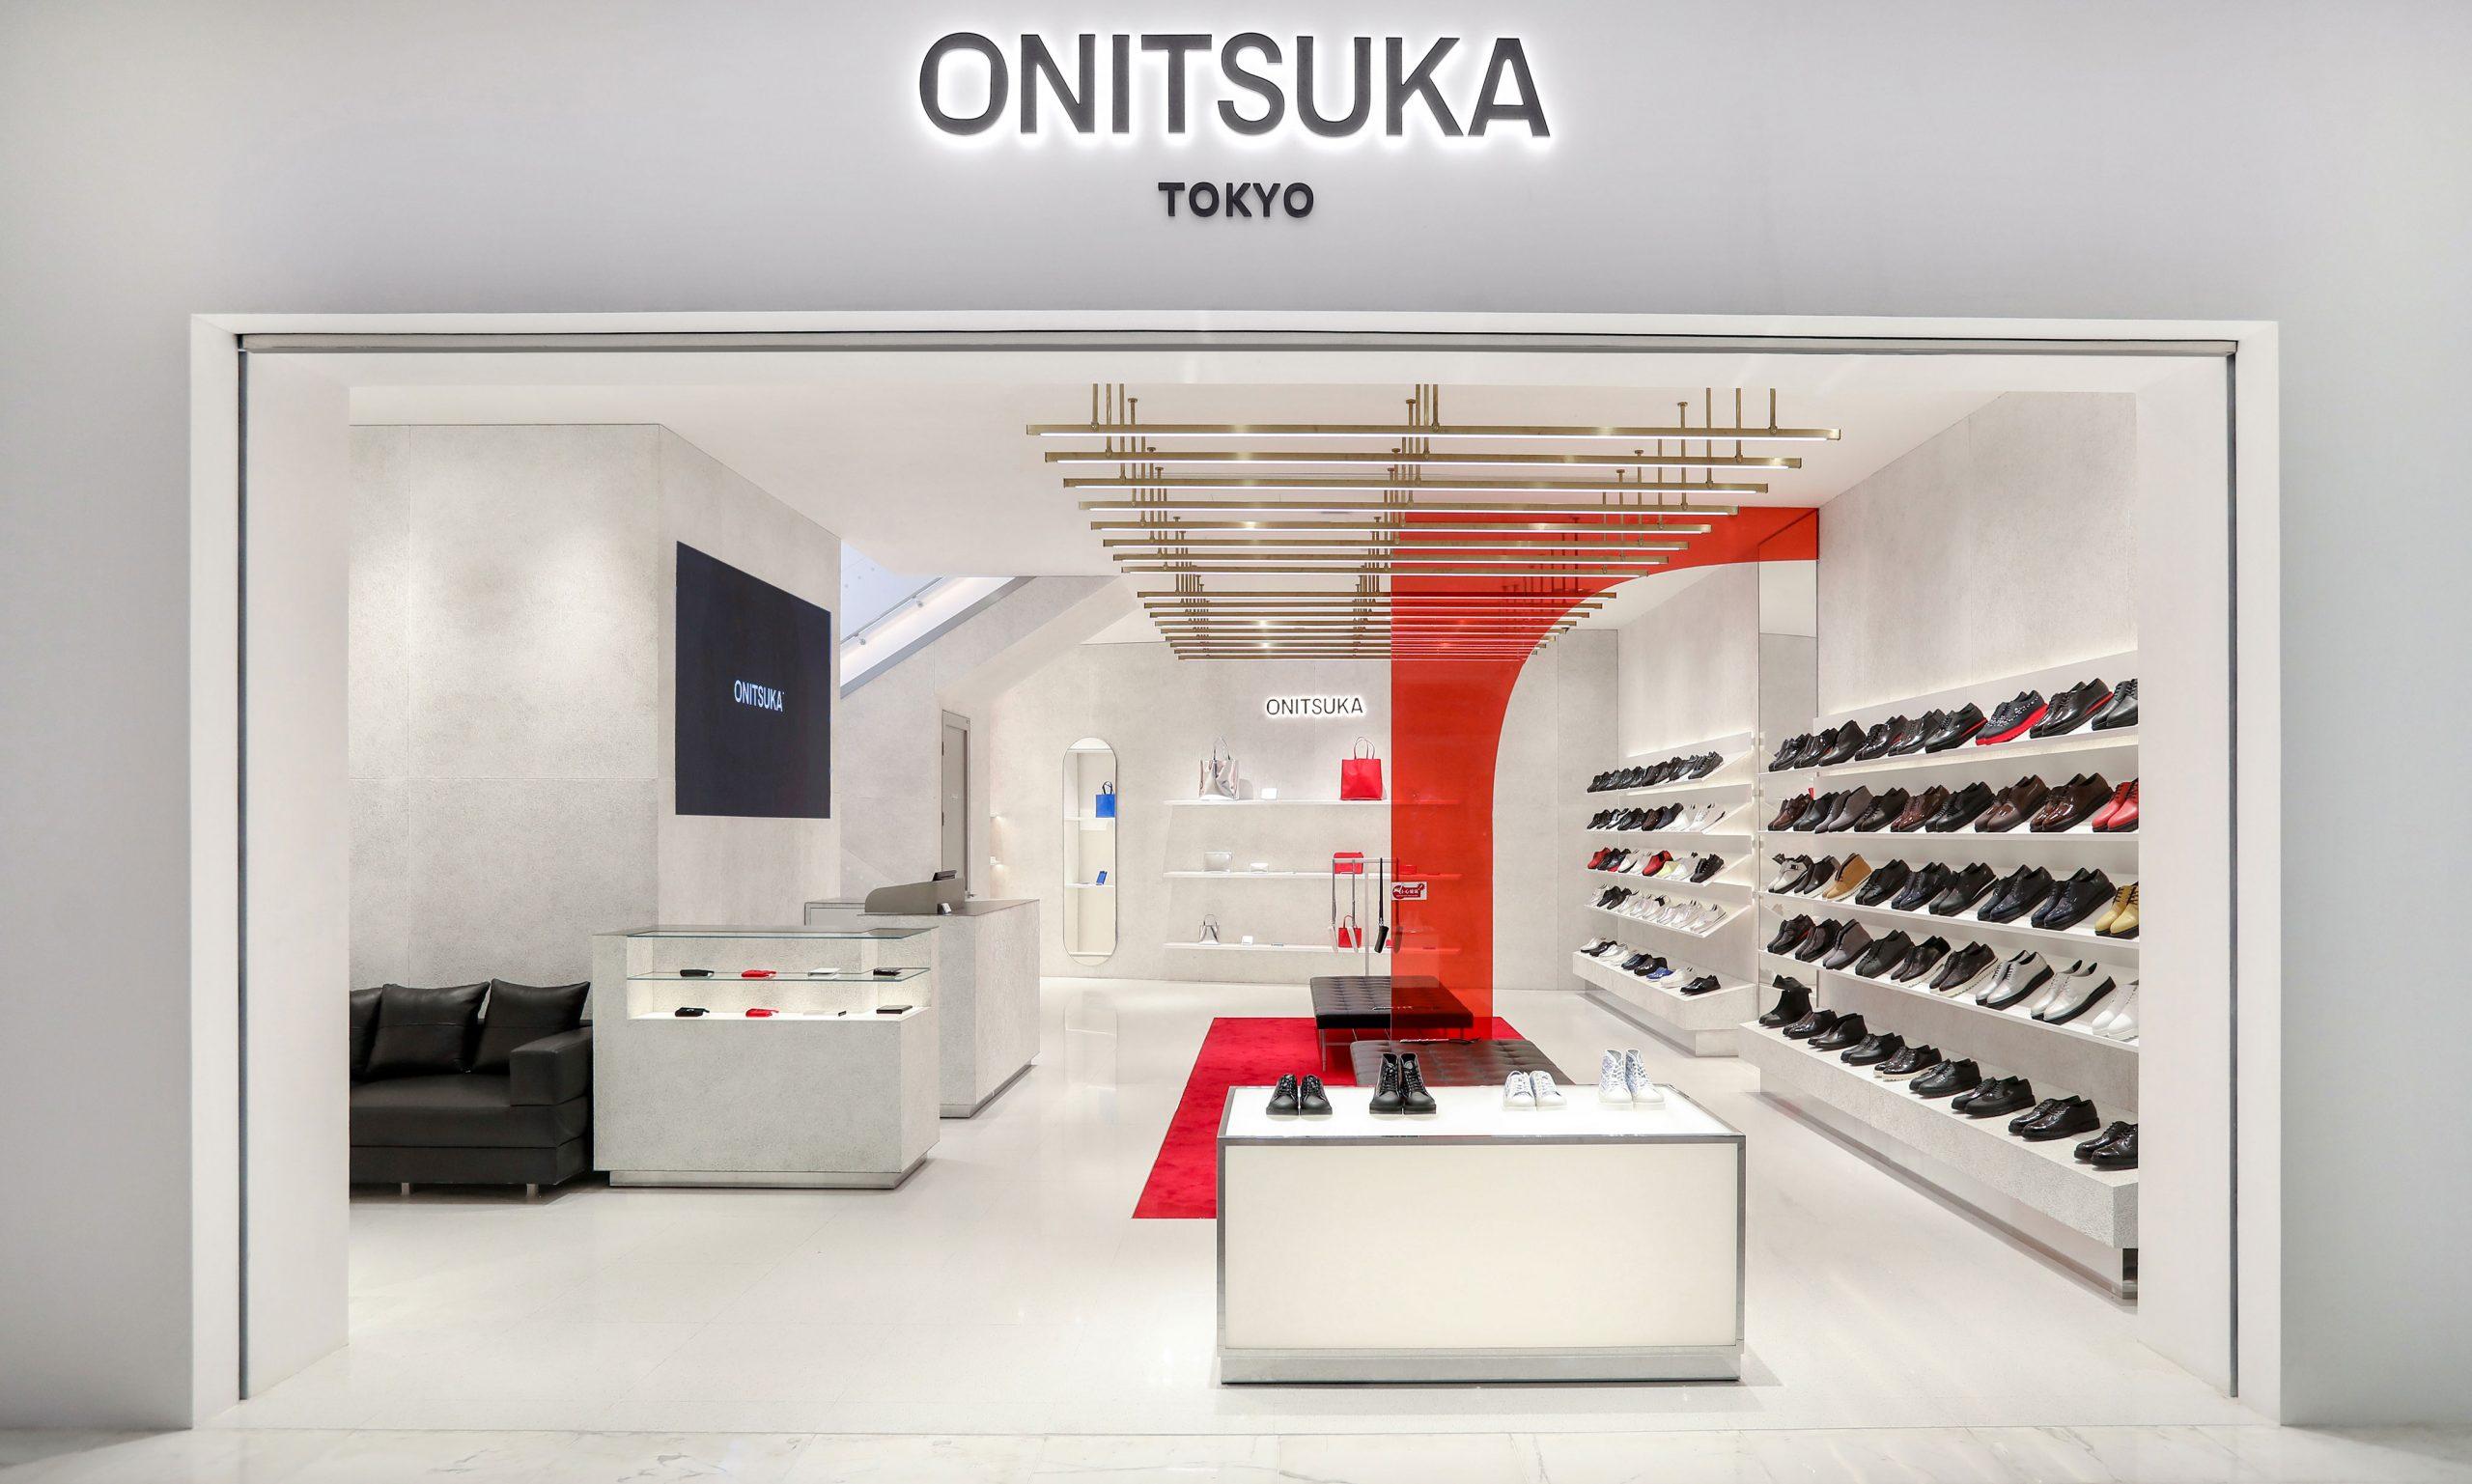 THE ONITSUKA™ 国内首家精品店盛大开幕